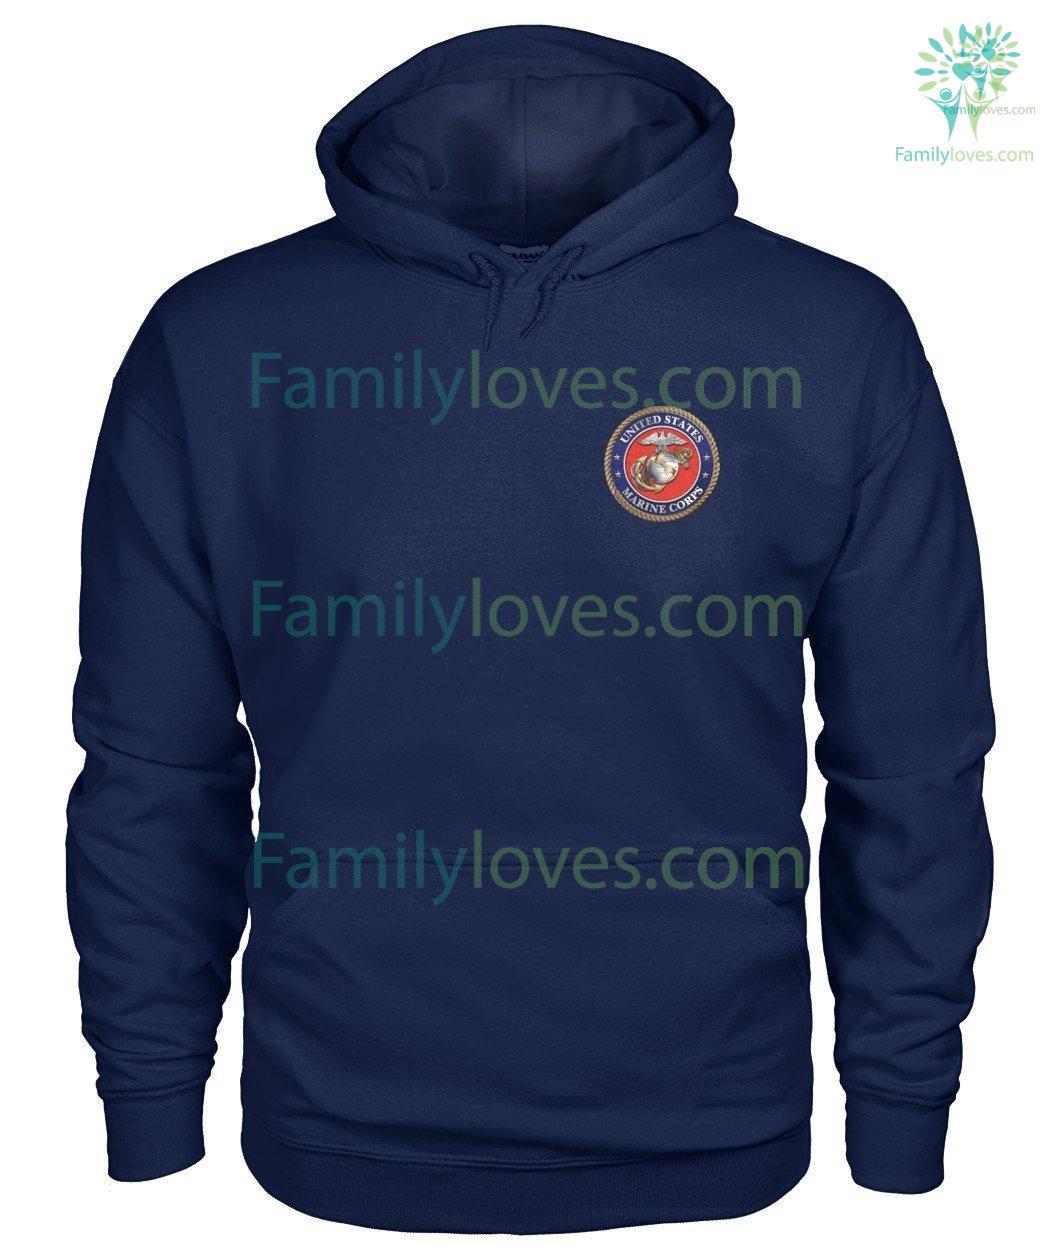 Buy US MARINE GILDAN HOODIES - Familyloves hoodies t-shirt jacket mug cheapest free shipping 50% off